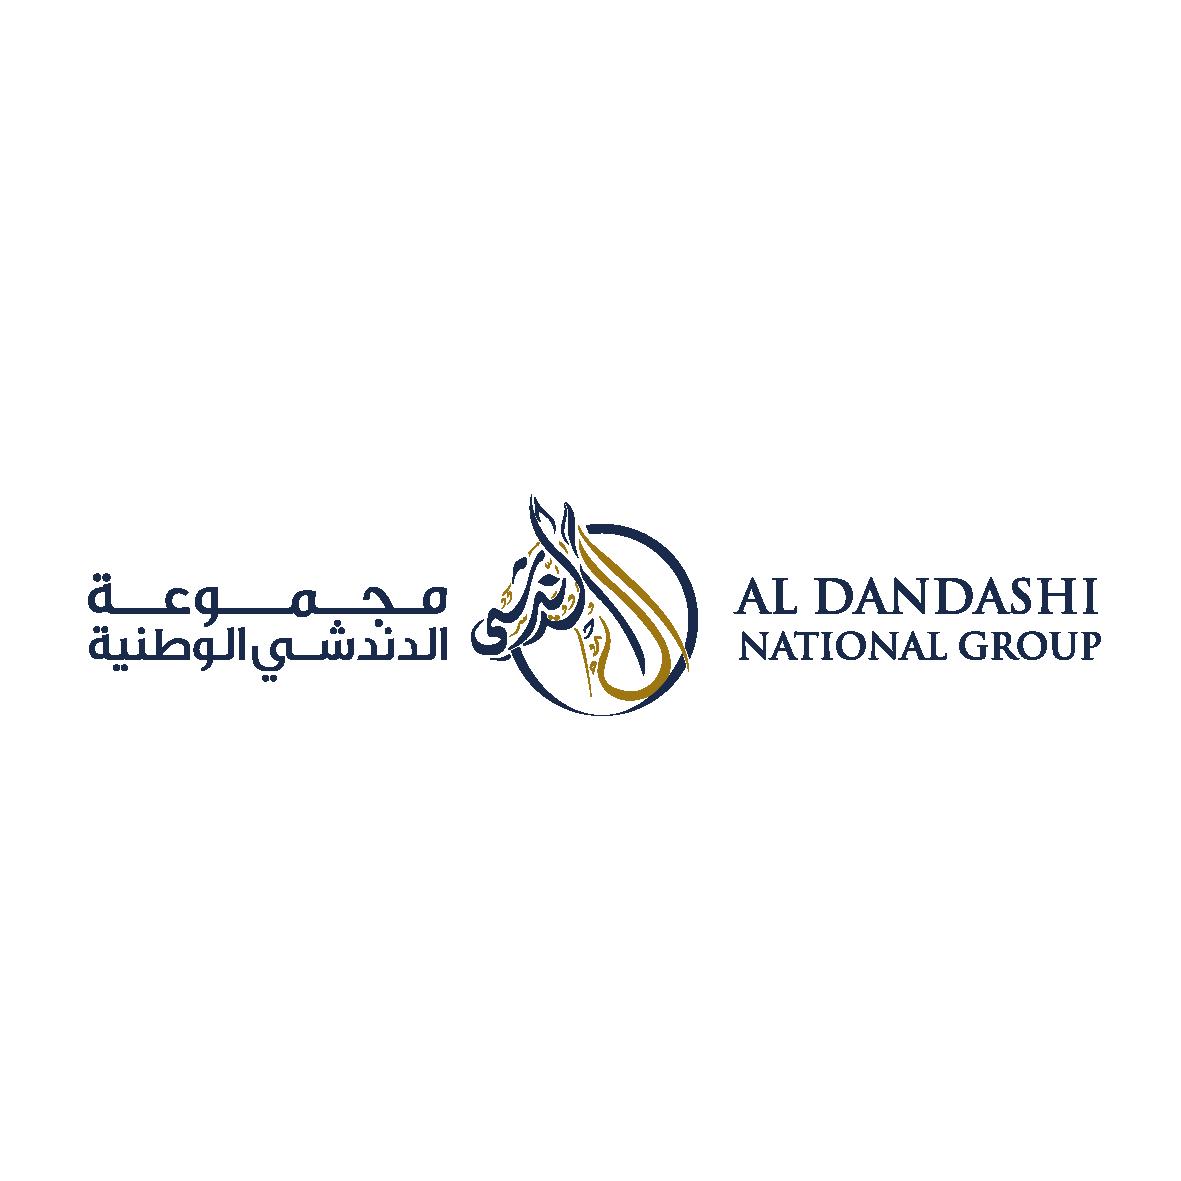 Al-Dandashi National group